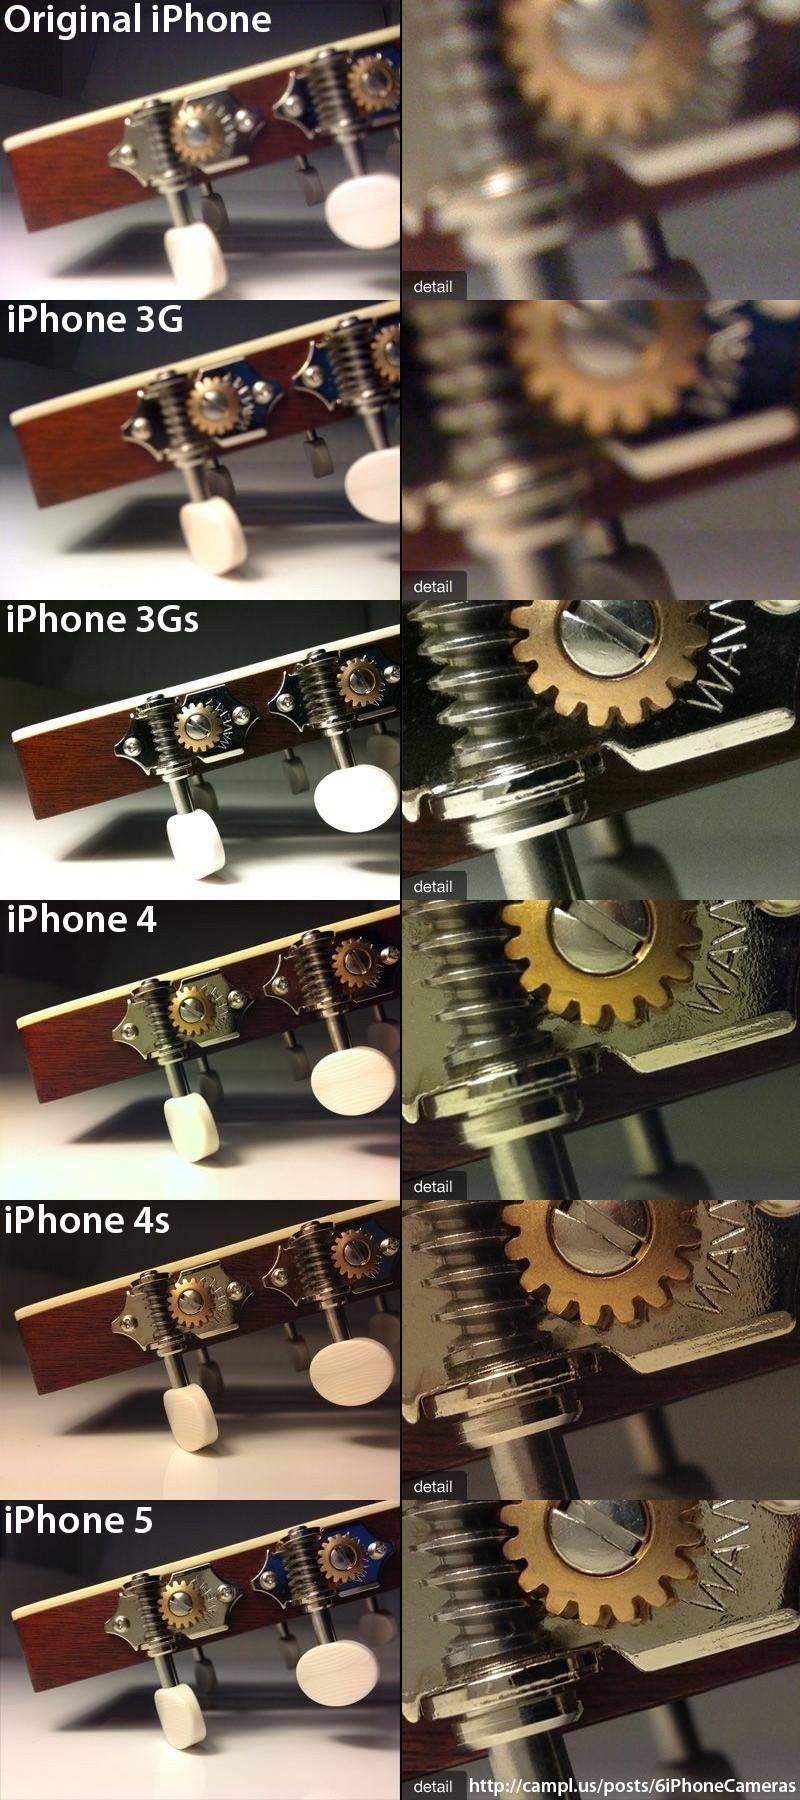 iphone_kamera_vergleich1